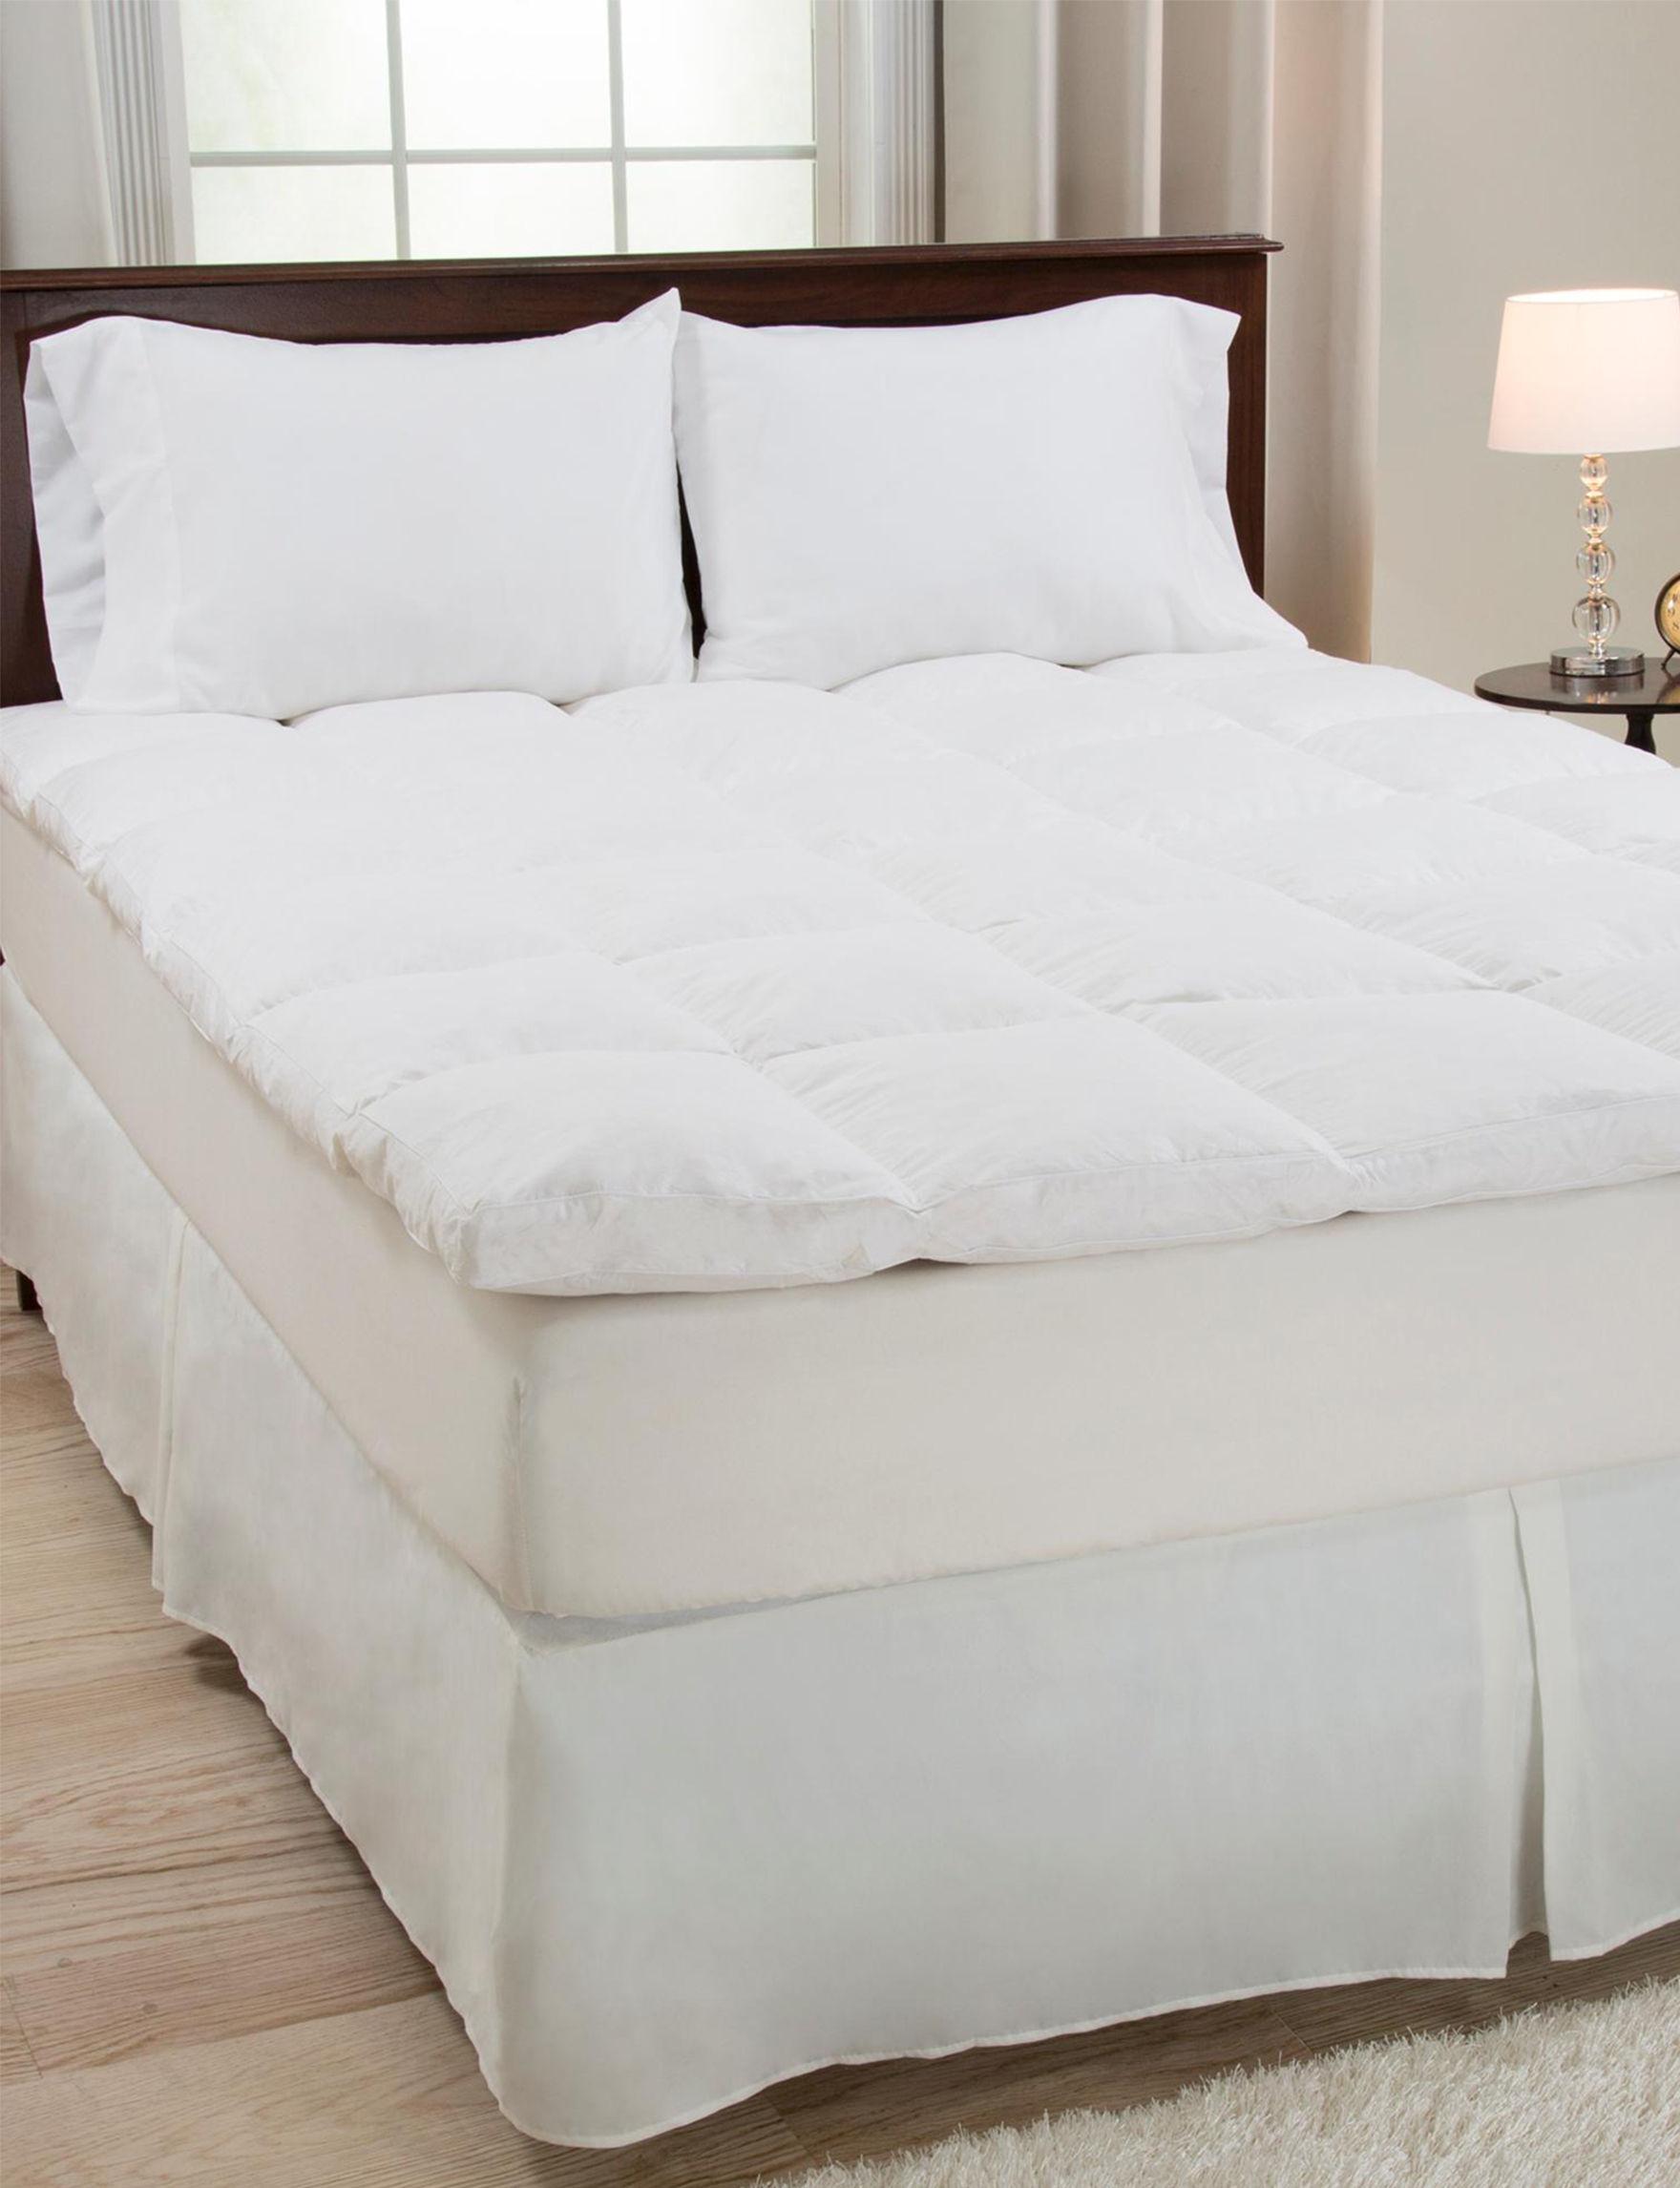 Lavish Home White Mattress Pads & Toppers